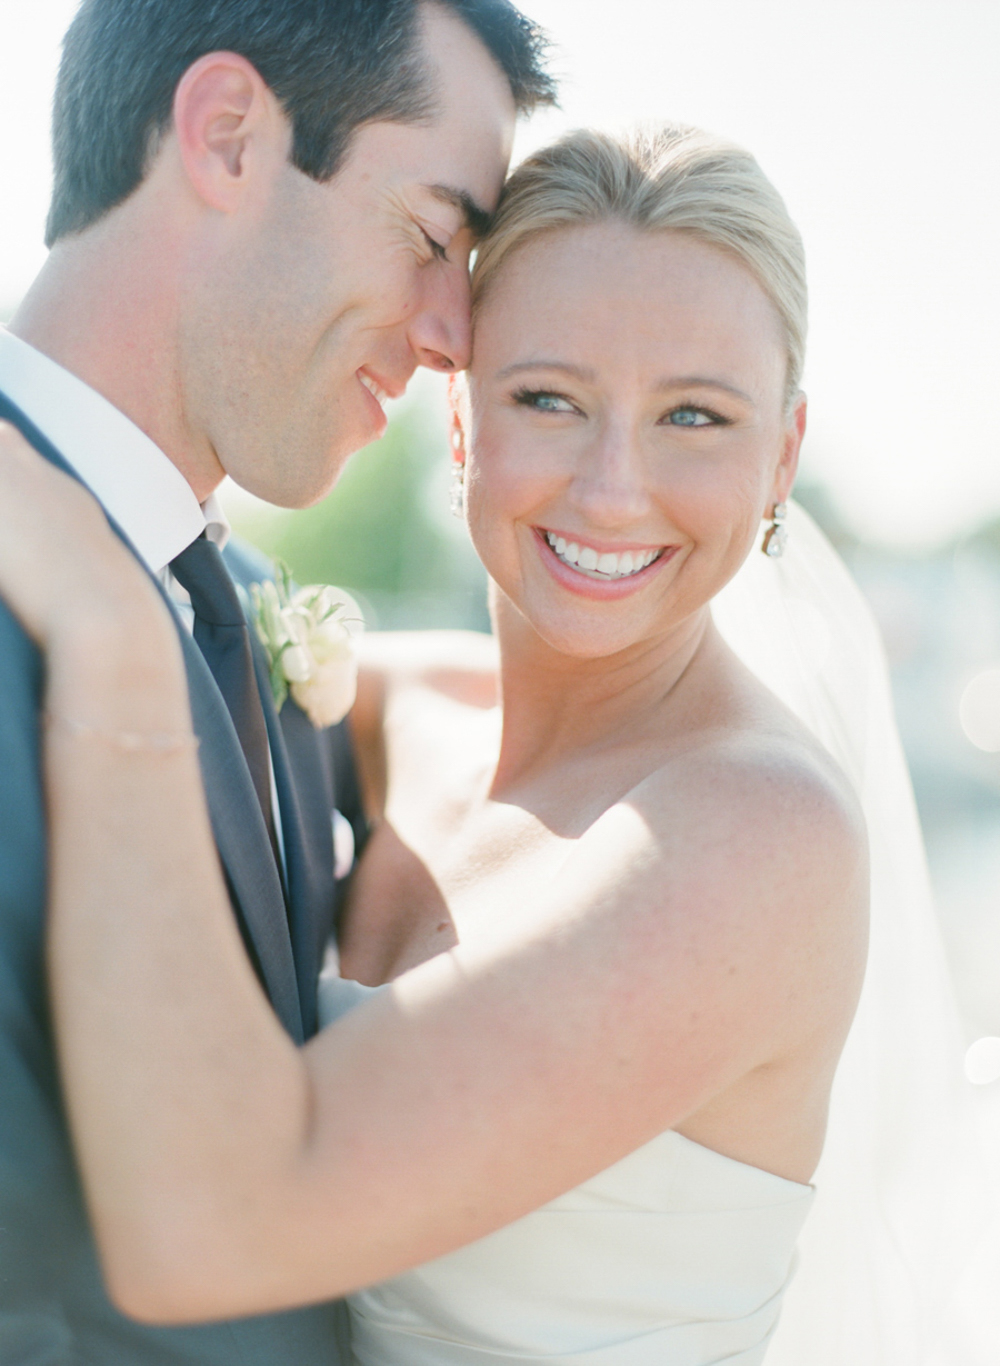 About_Thyme_Farm_Door_County_Wedding_018.jpg